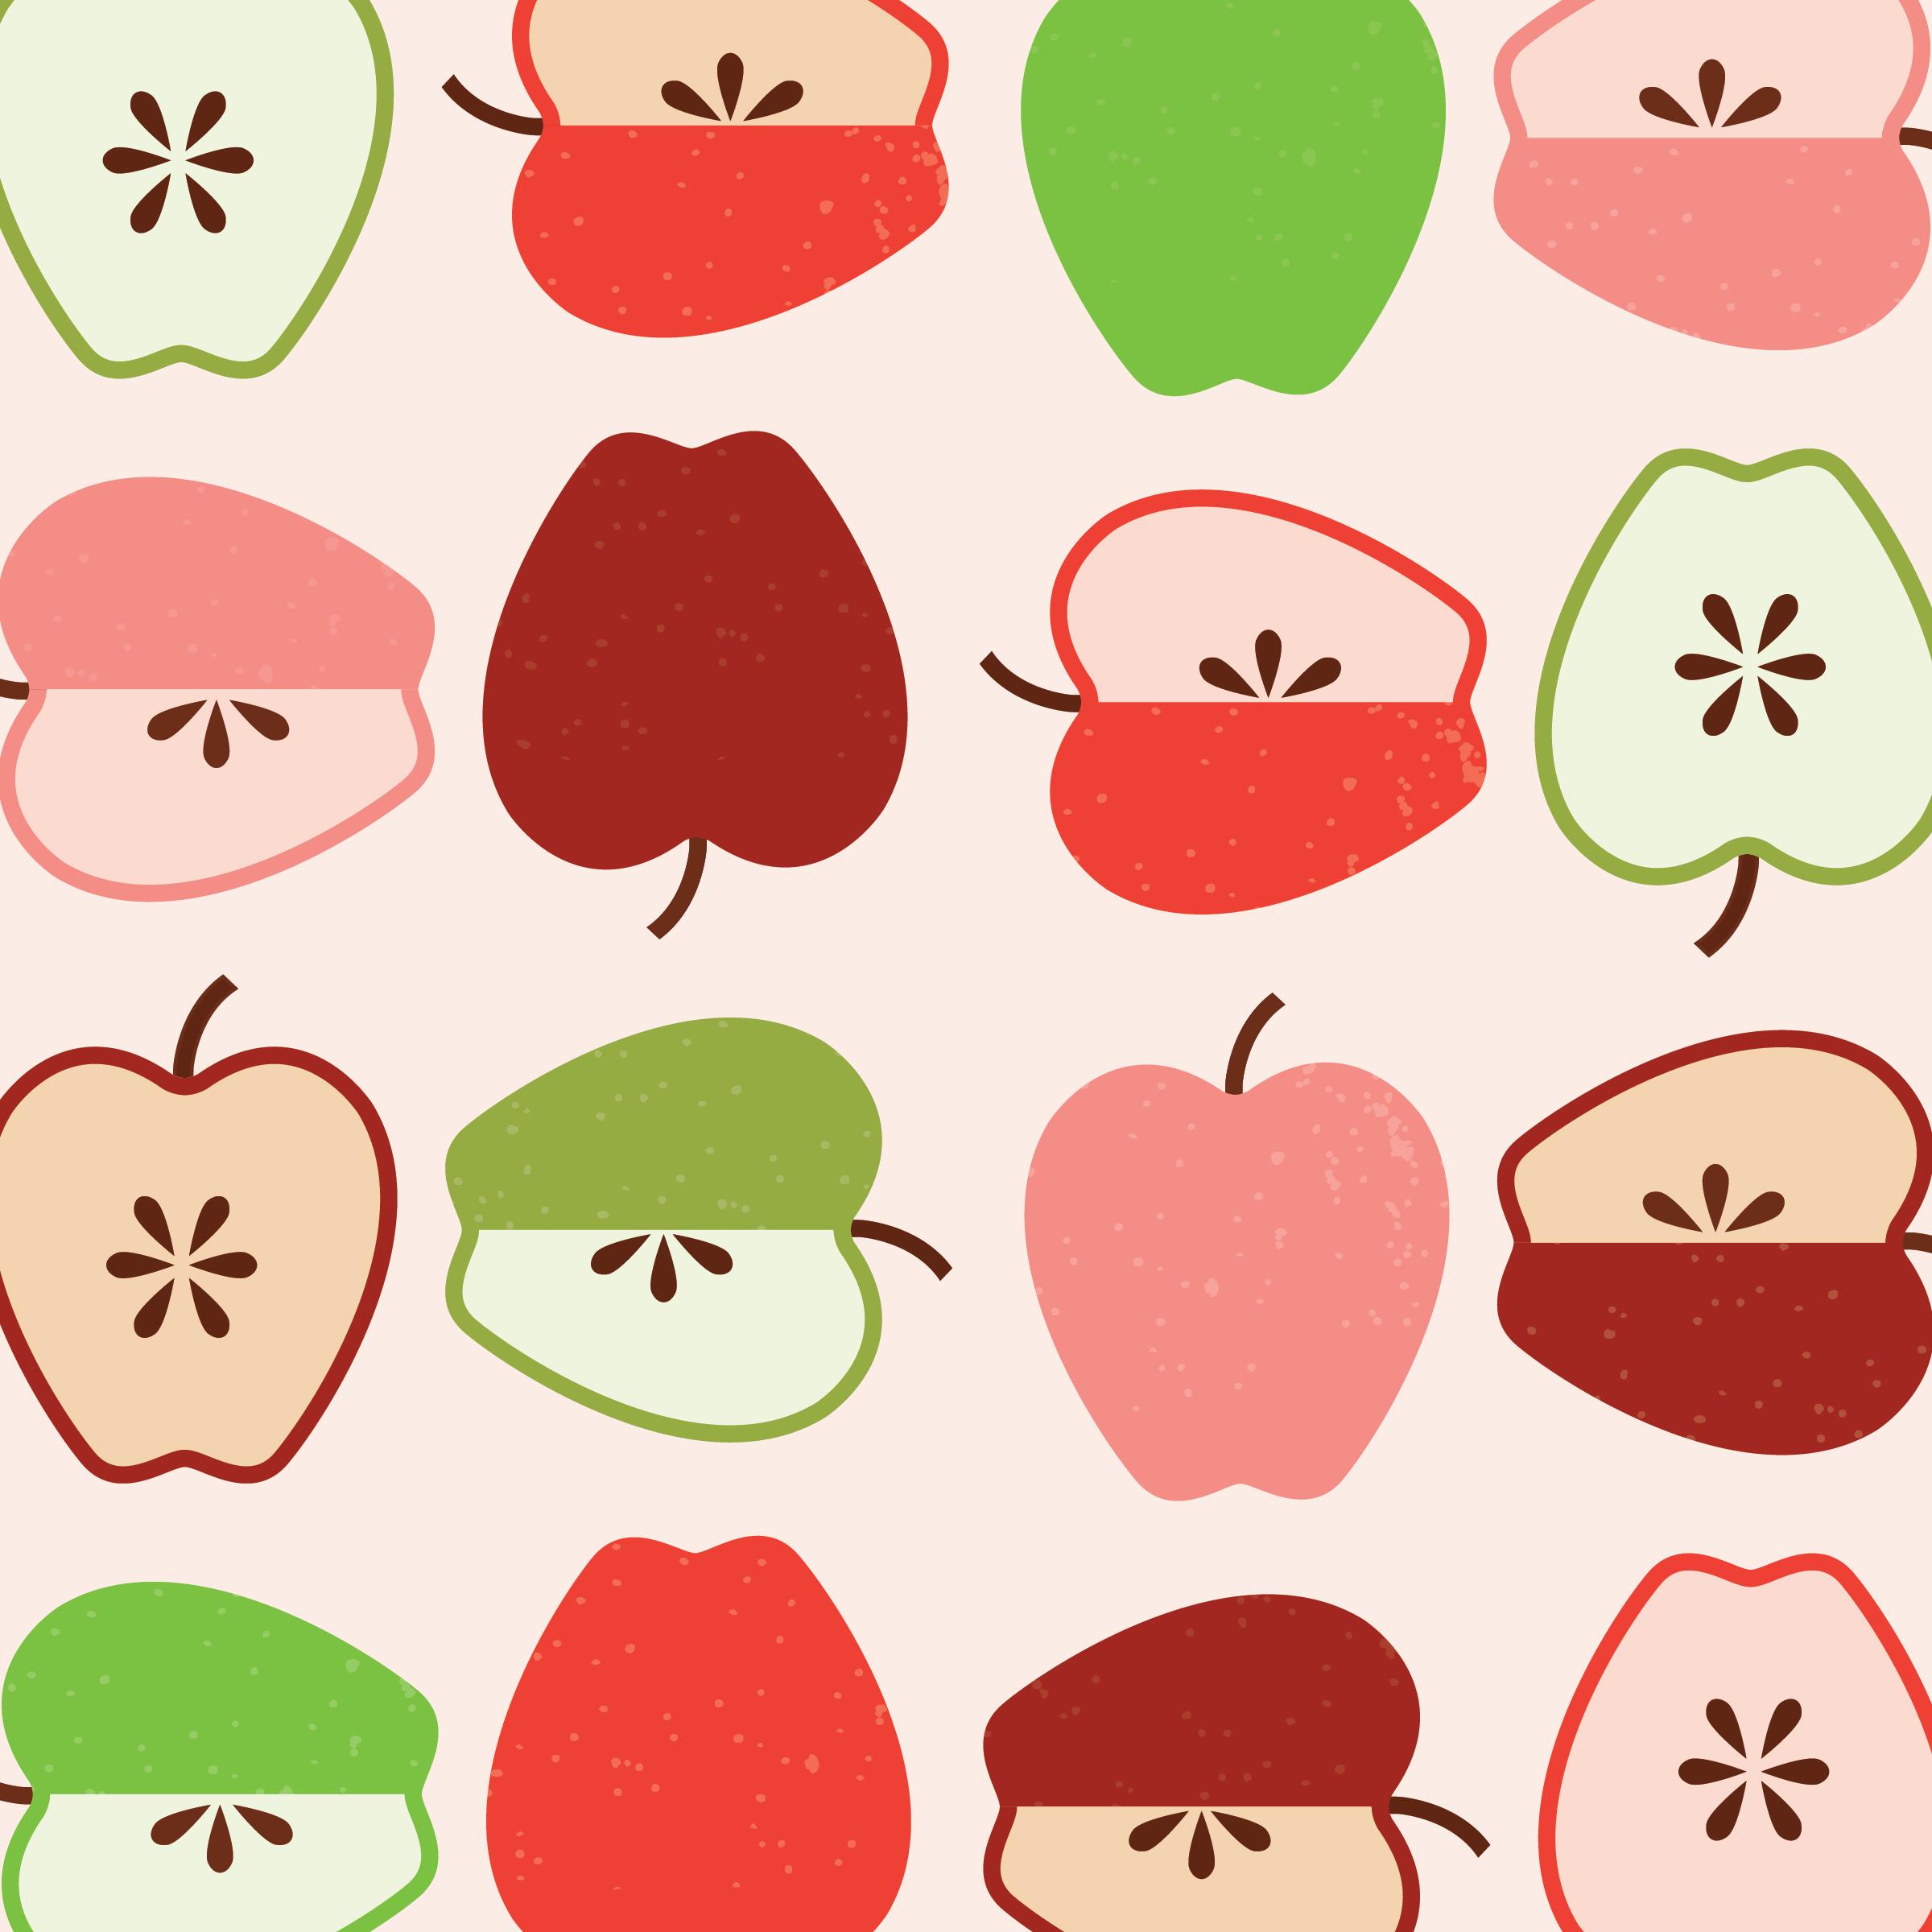 apple pattern behance-01.png